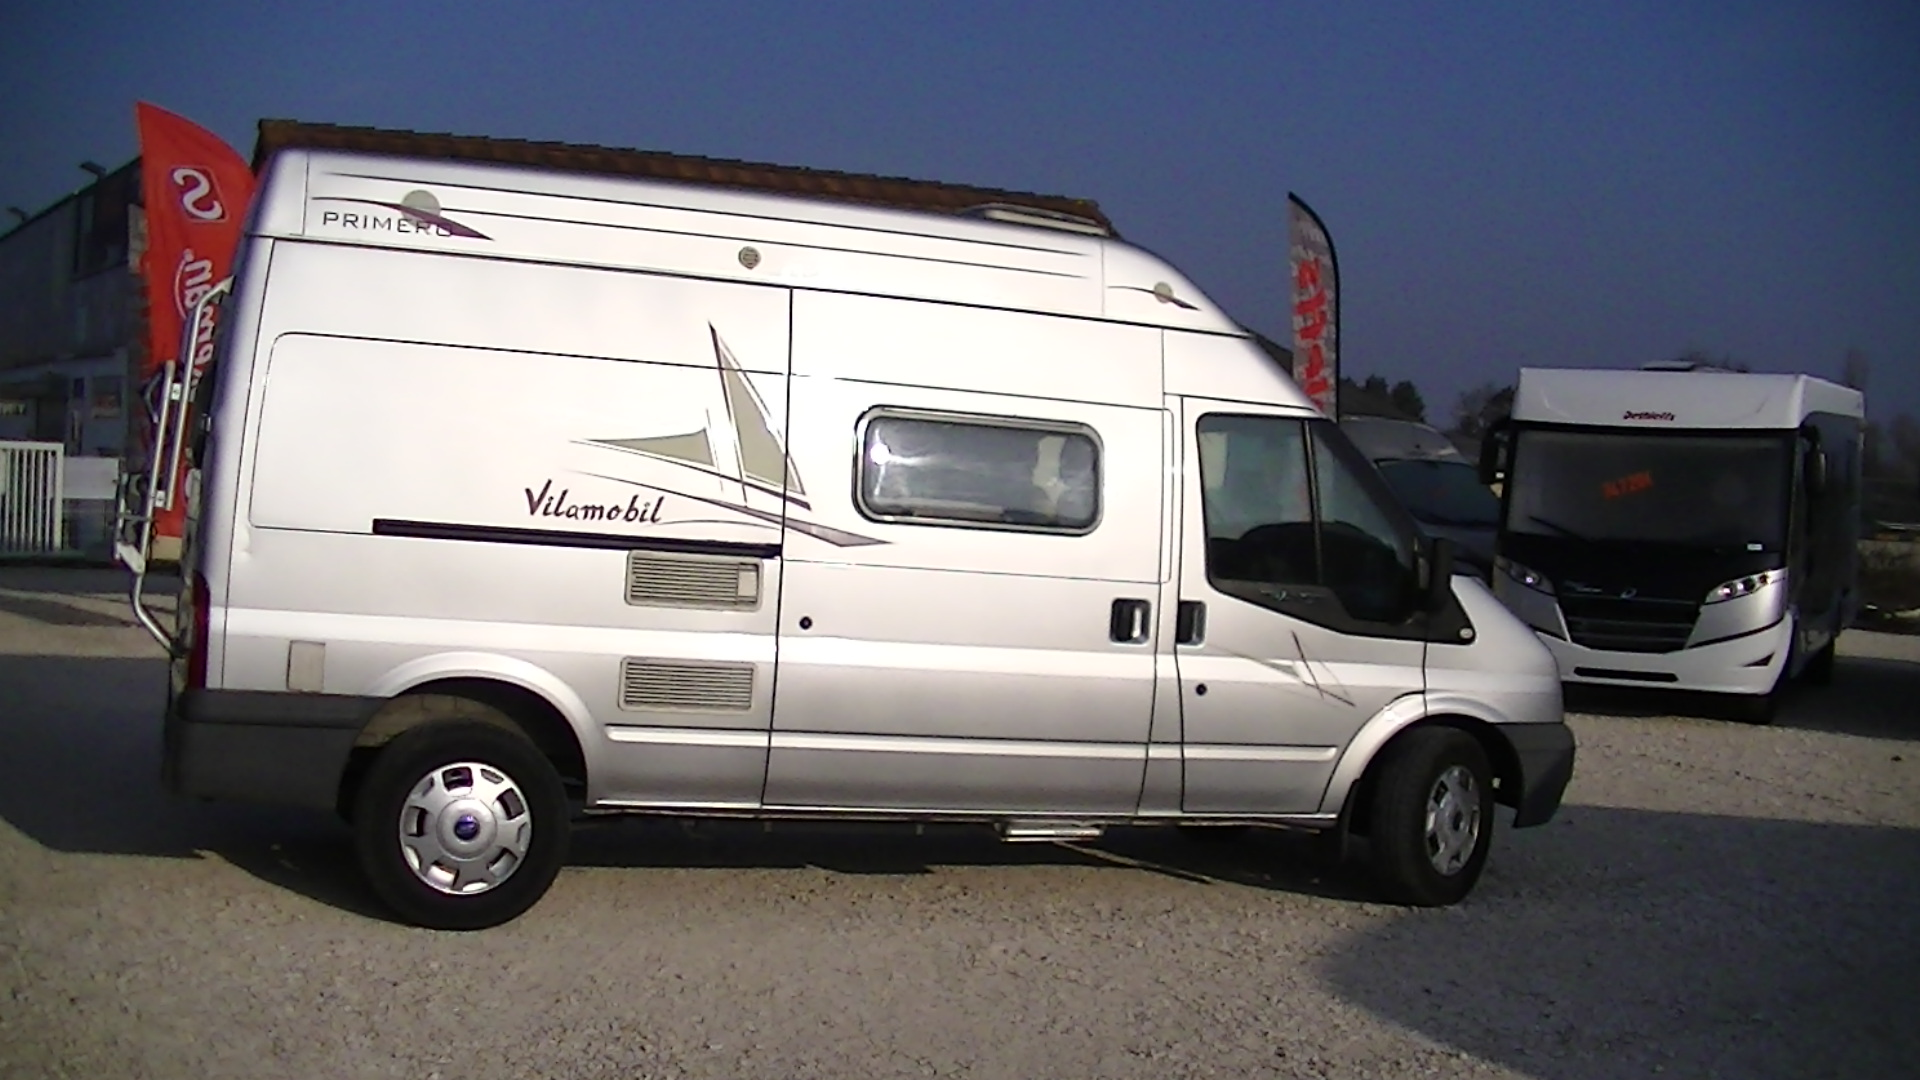 rimor horus occasion de 2010 ford camping car en vente appoigny yonne 89. Black Bedroom Furniture Sets. Home Design Ideas